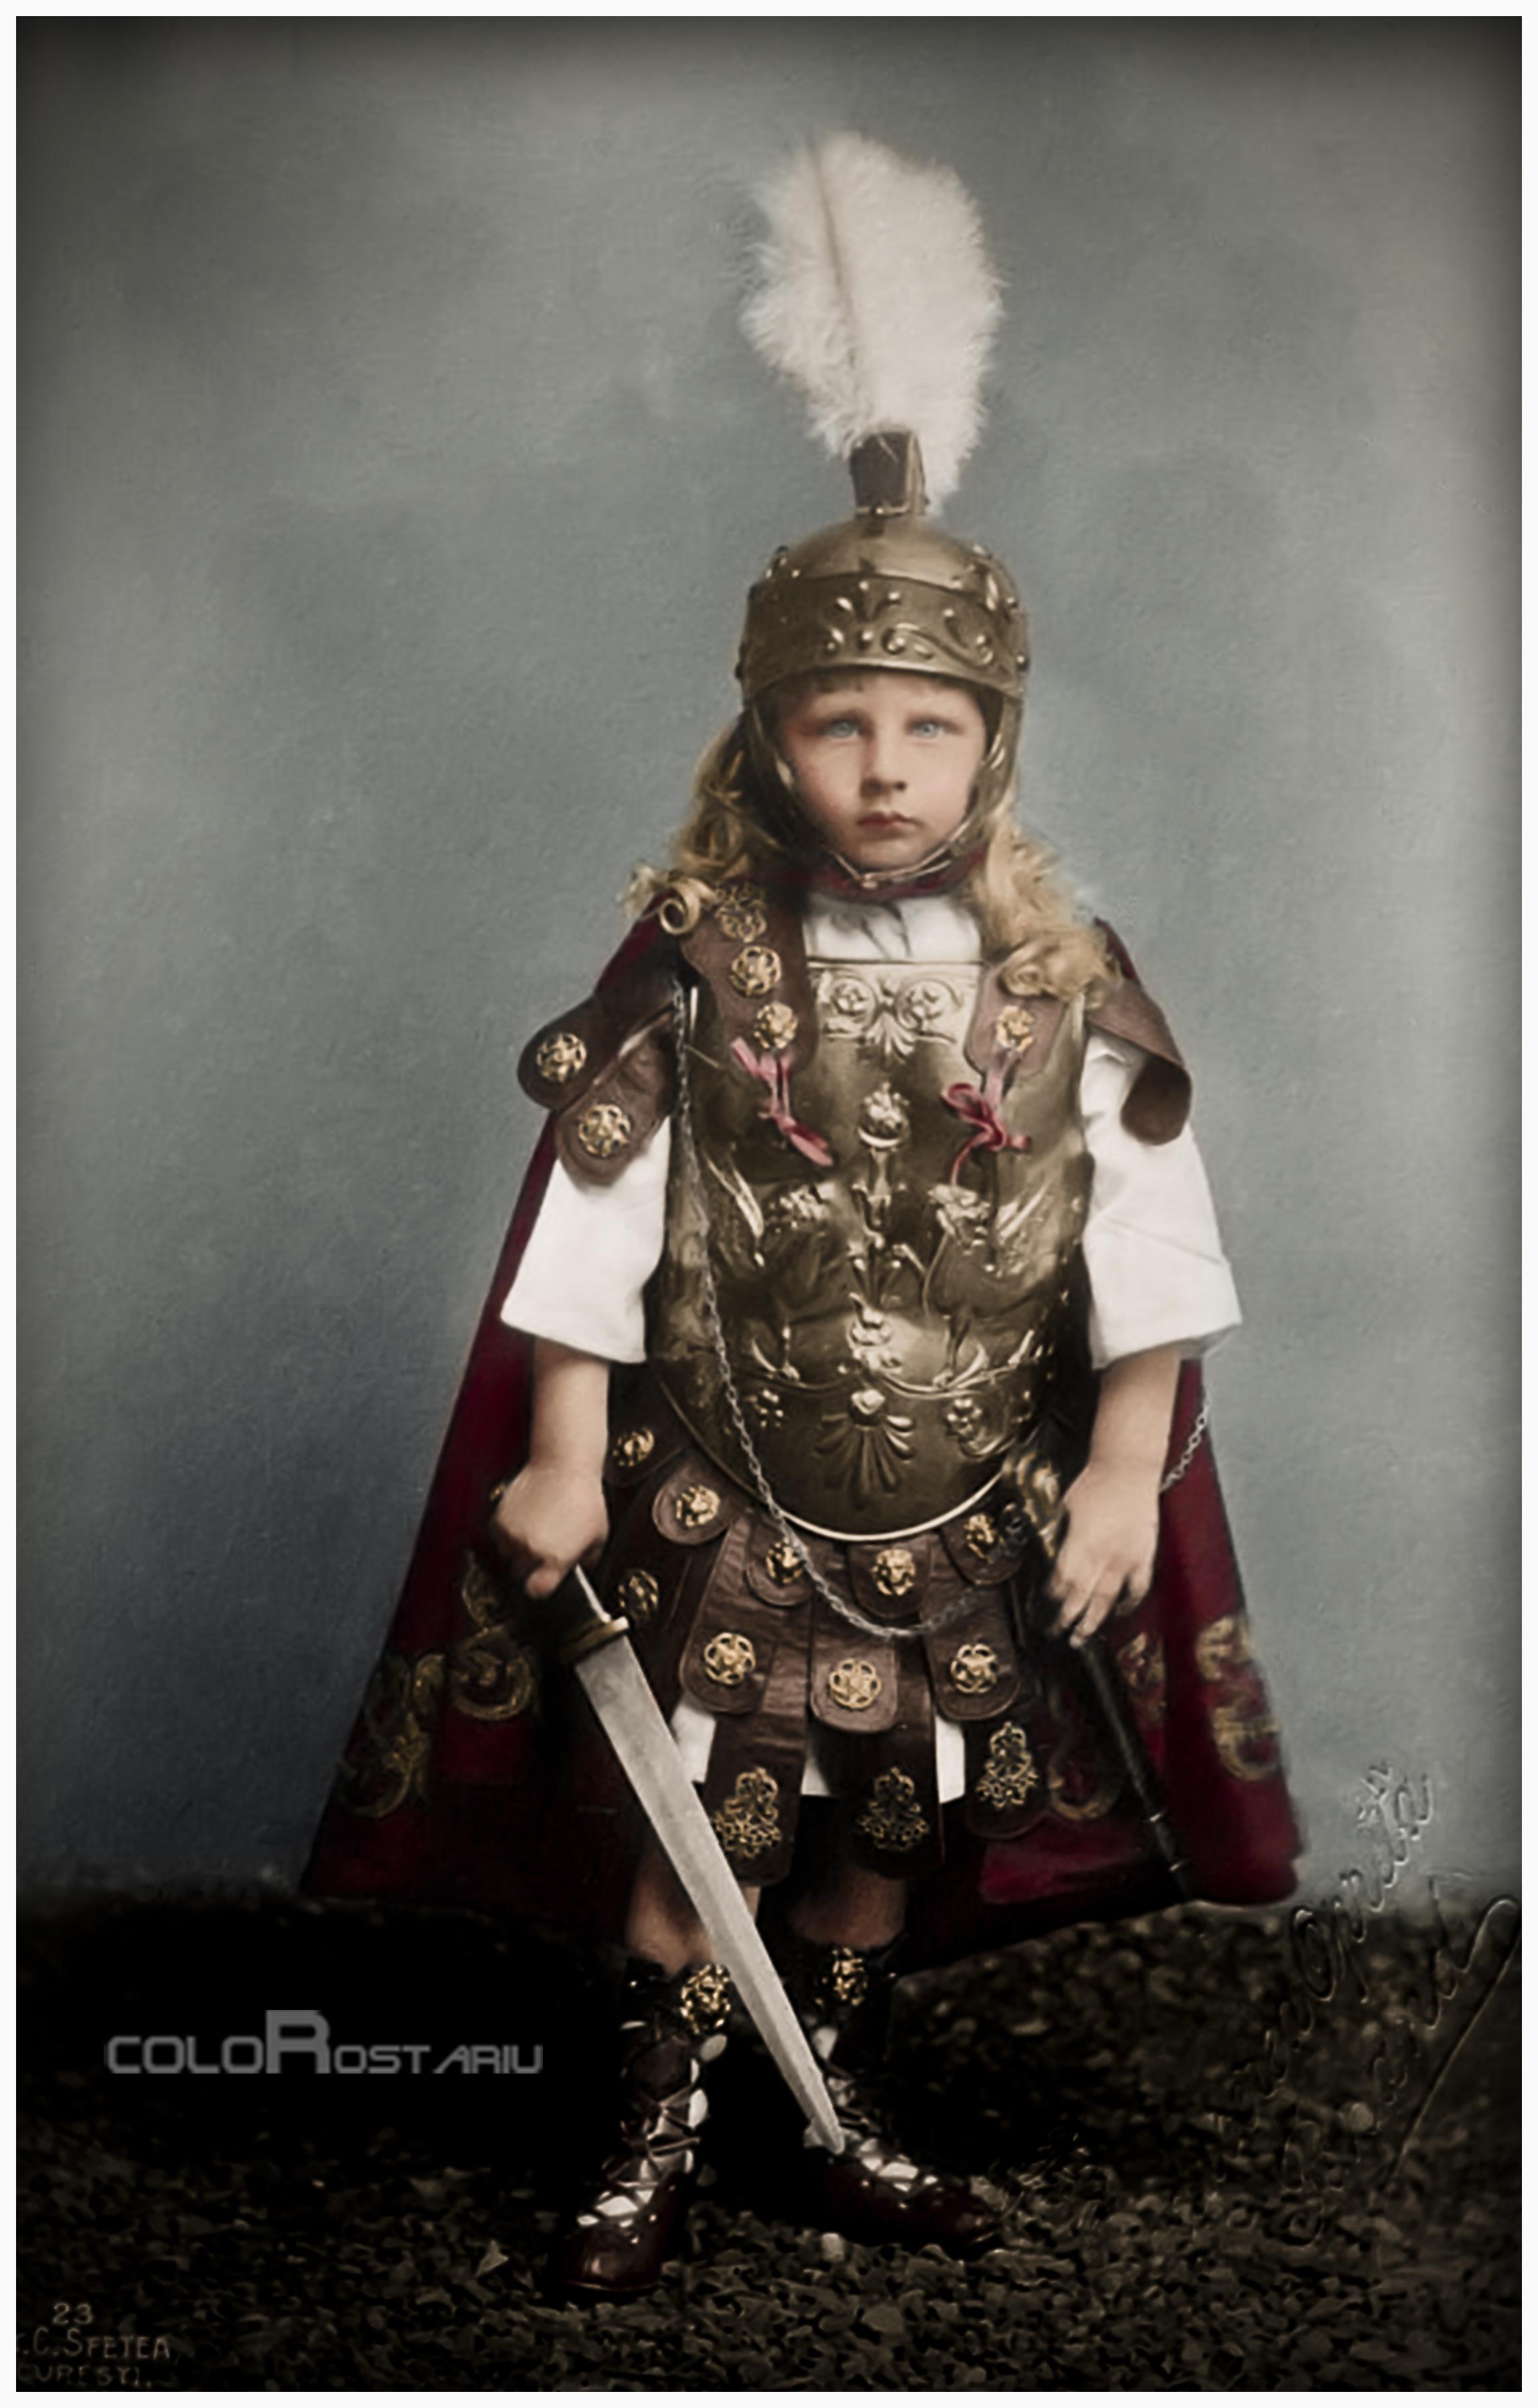 printul-nicolae-al-romaniei-prince-nicholas-of-romania-king-ferdinand-and-queen-marie-of-romania-british-royal-navy.jpg